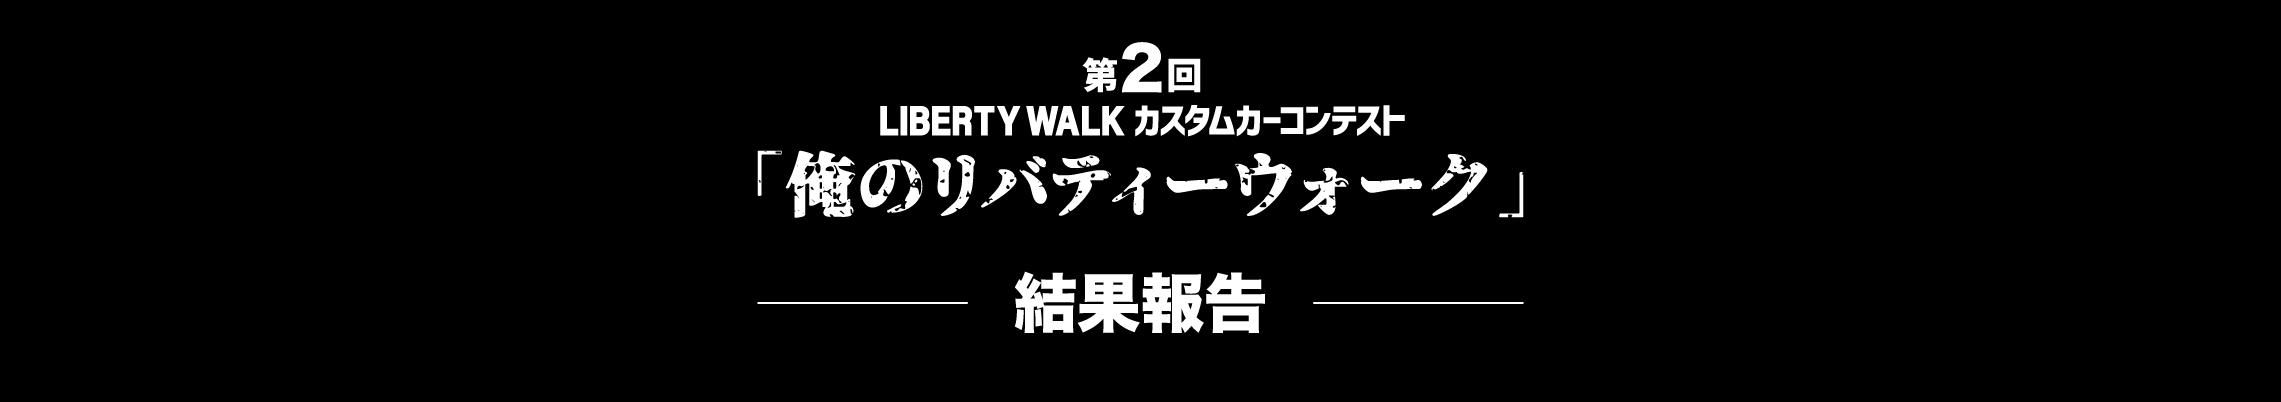 01 LB-HOBBY RESULT 第2回 受賞作品